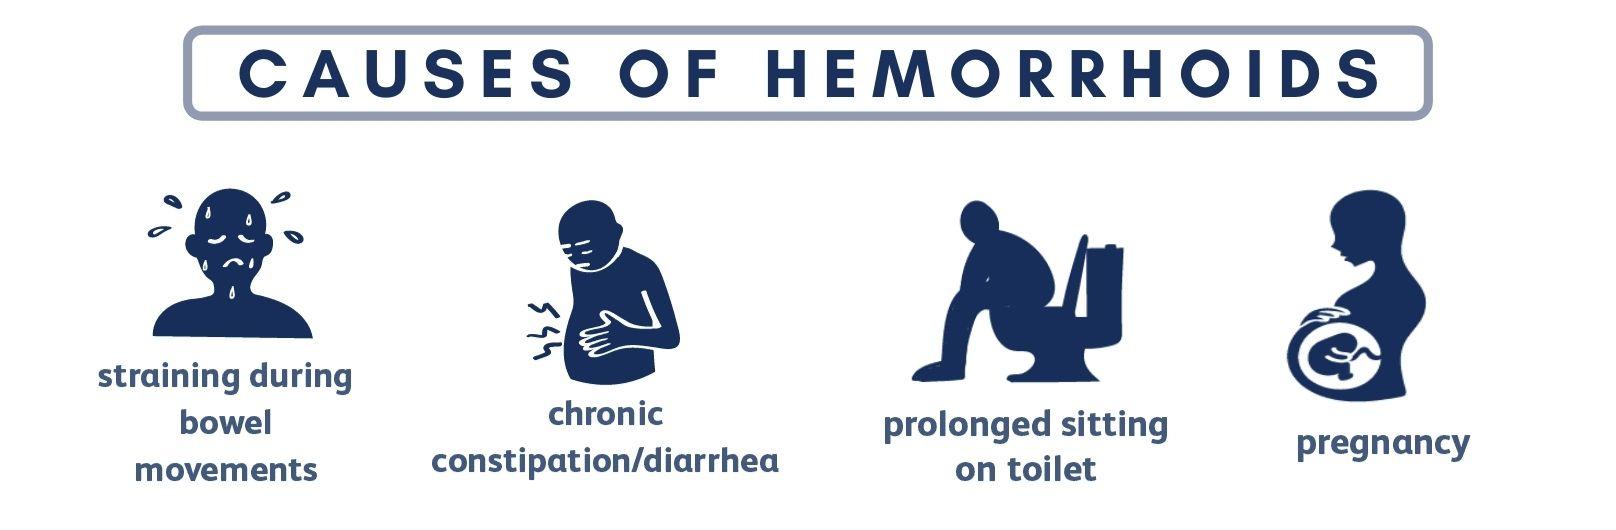 causes of hemorrhoids